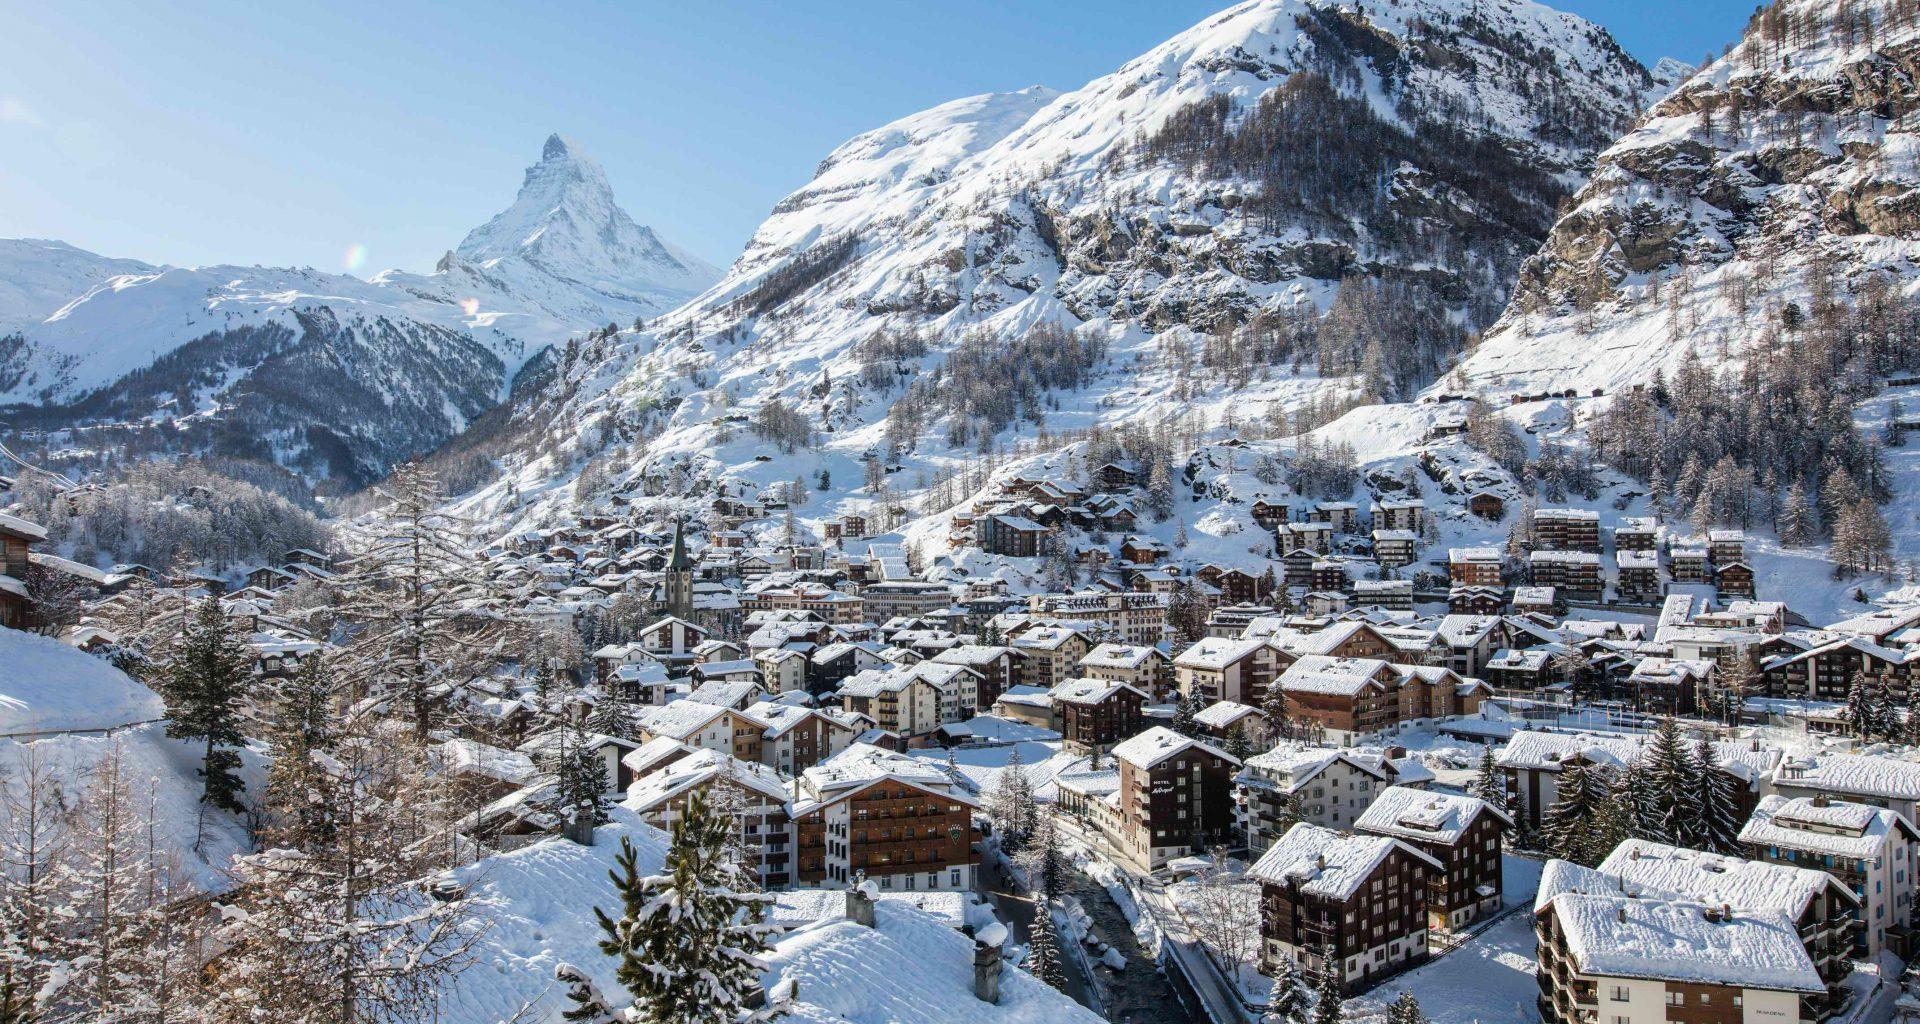 Winter in Zermatt